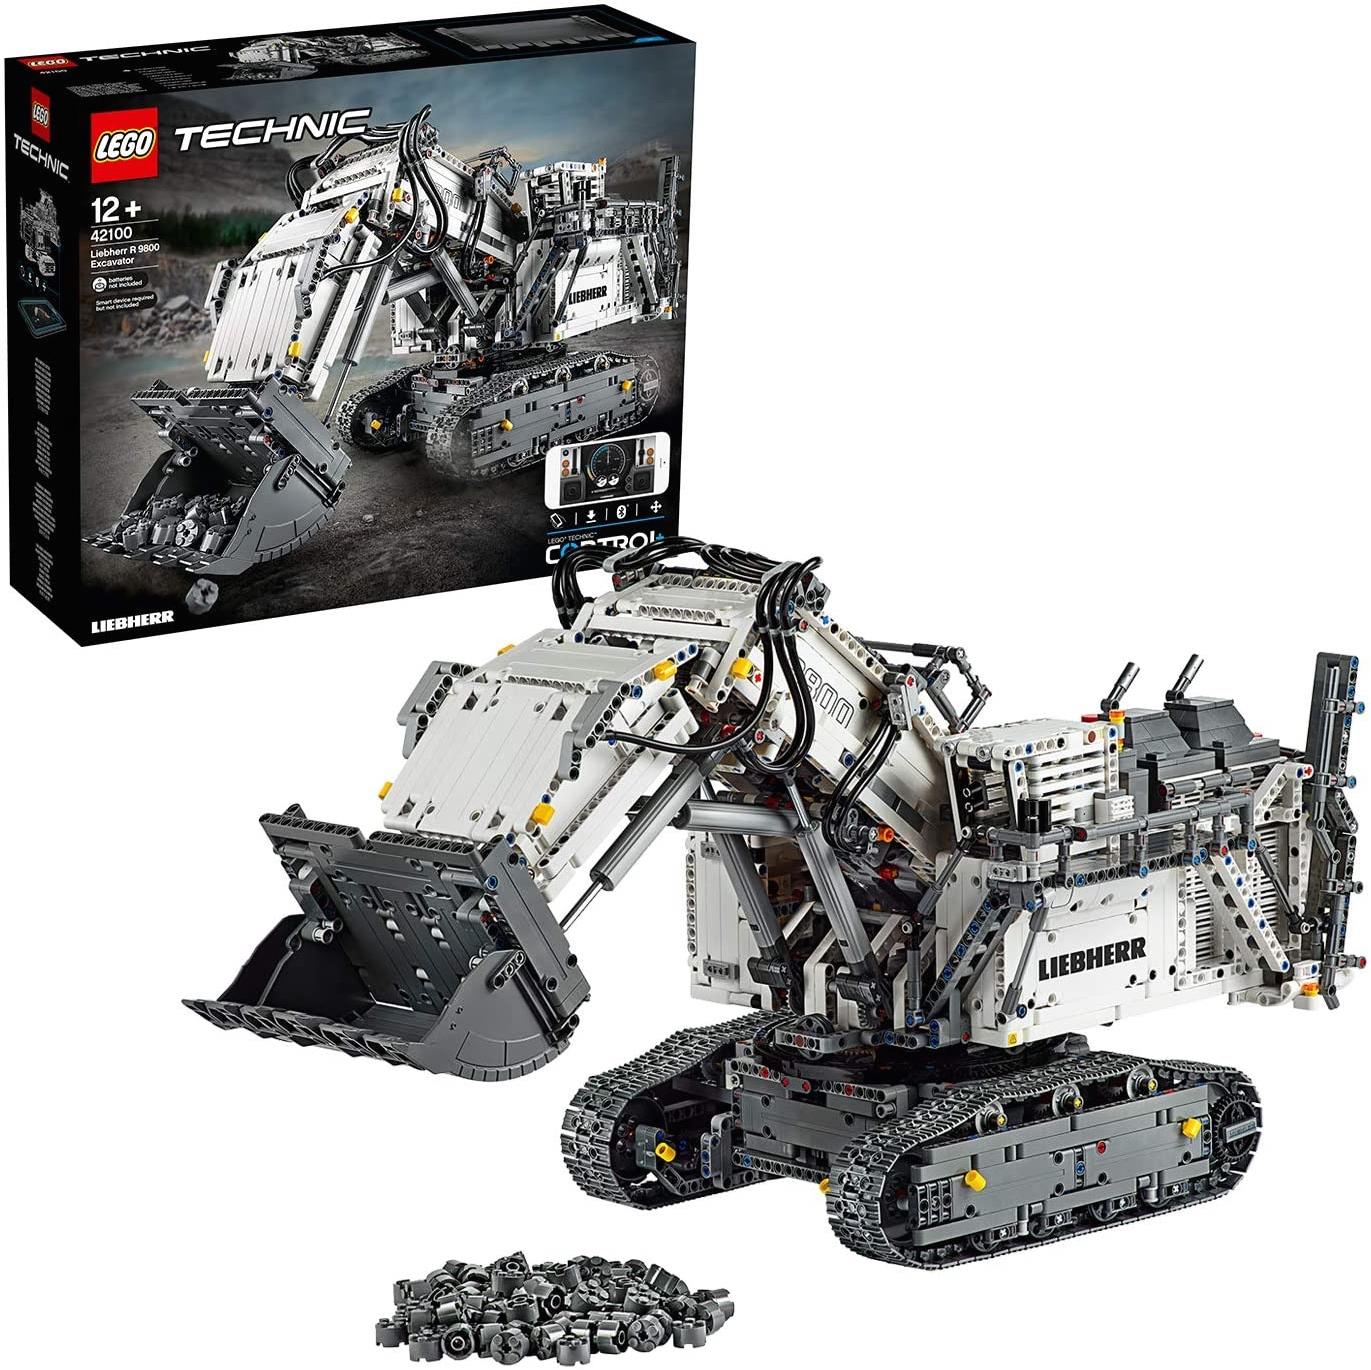 LEGO Technic 42100 Liebherr R 9800 Excavator £248.79 with code (member offer) @ John Lewis & Partners